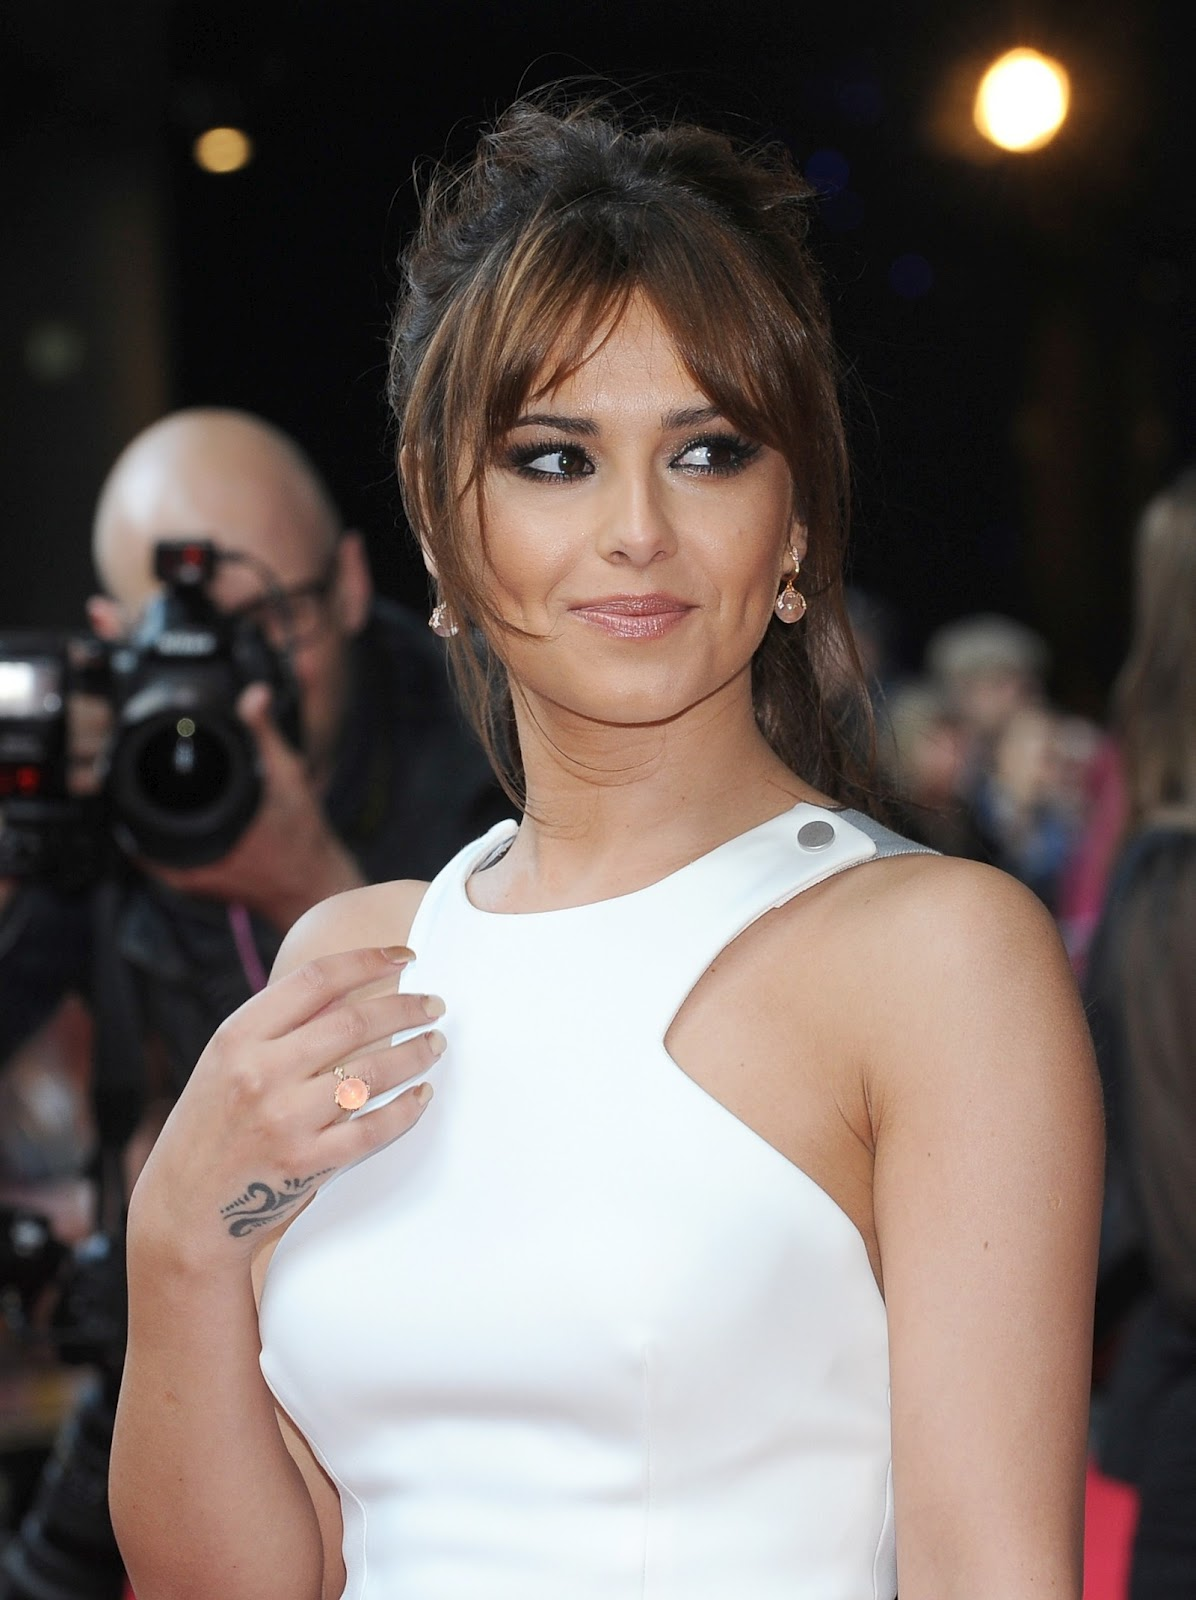 Bollytter: Cheryl Cole Hot Wallpapers in White